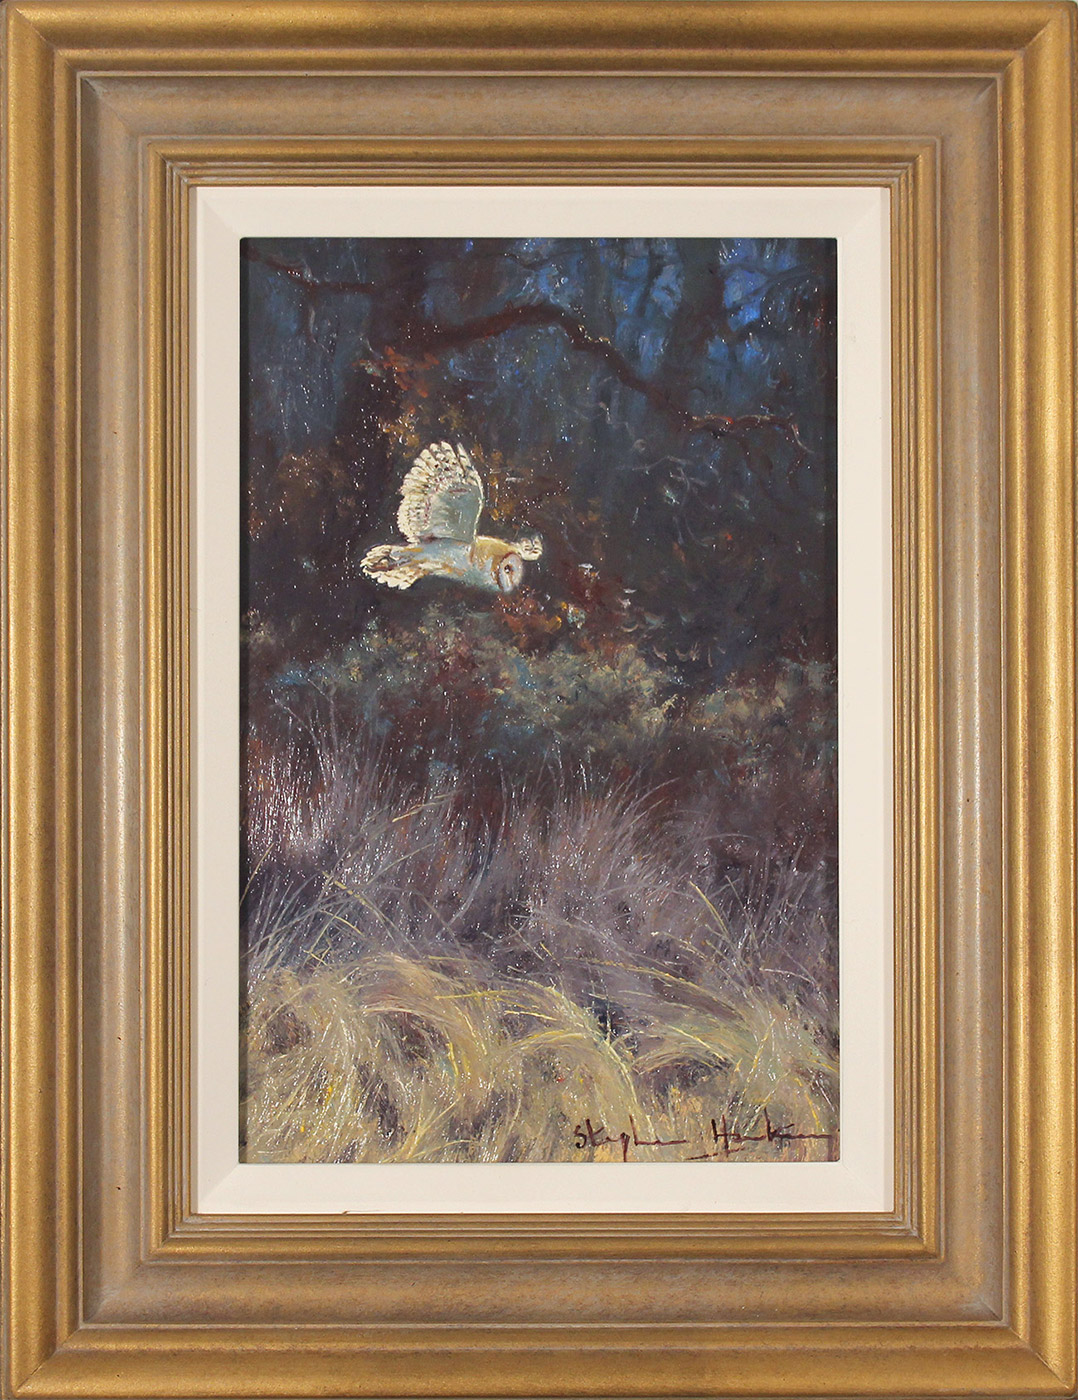 Stephen Hawkins, Original oil painting on panel, Barn Owl in Flight, click to enlarge